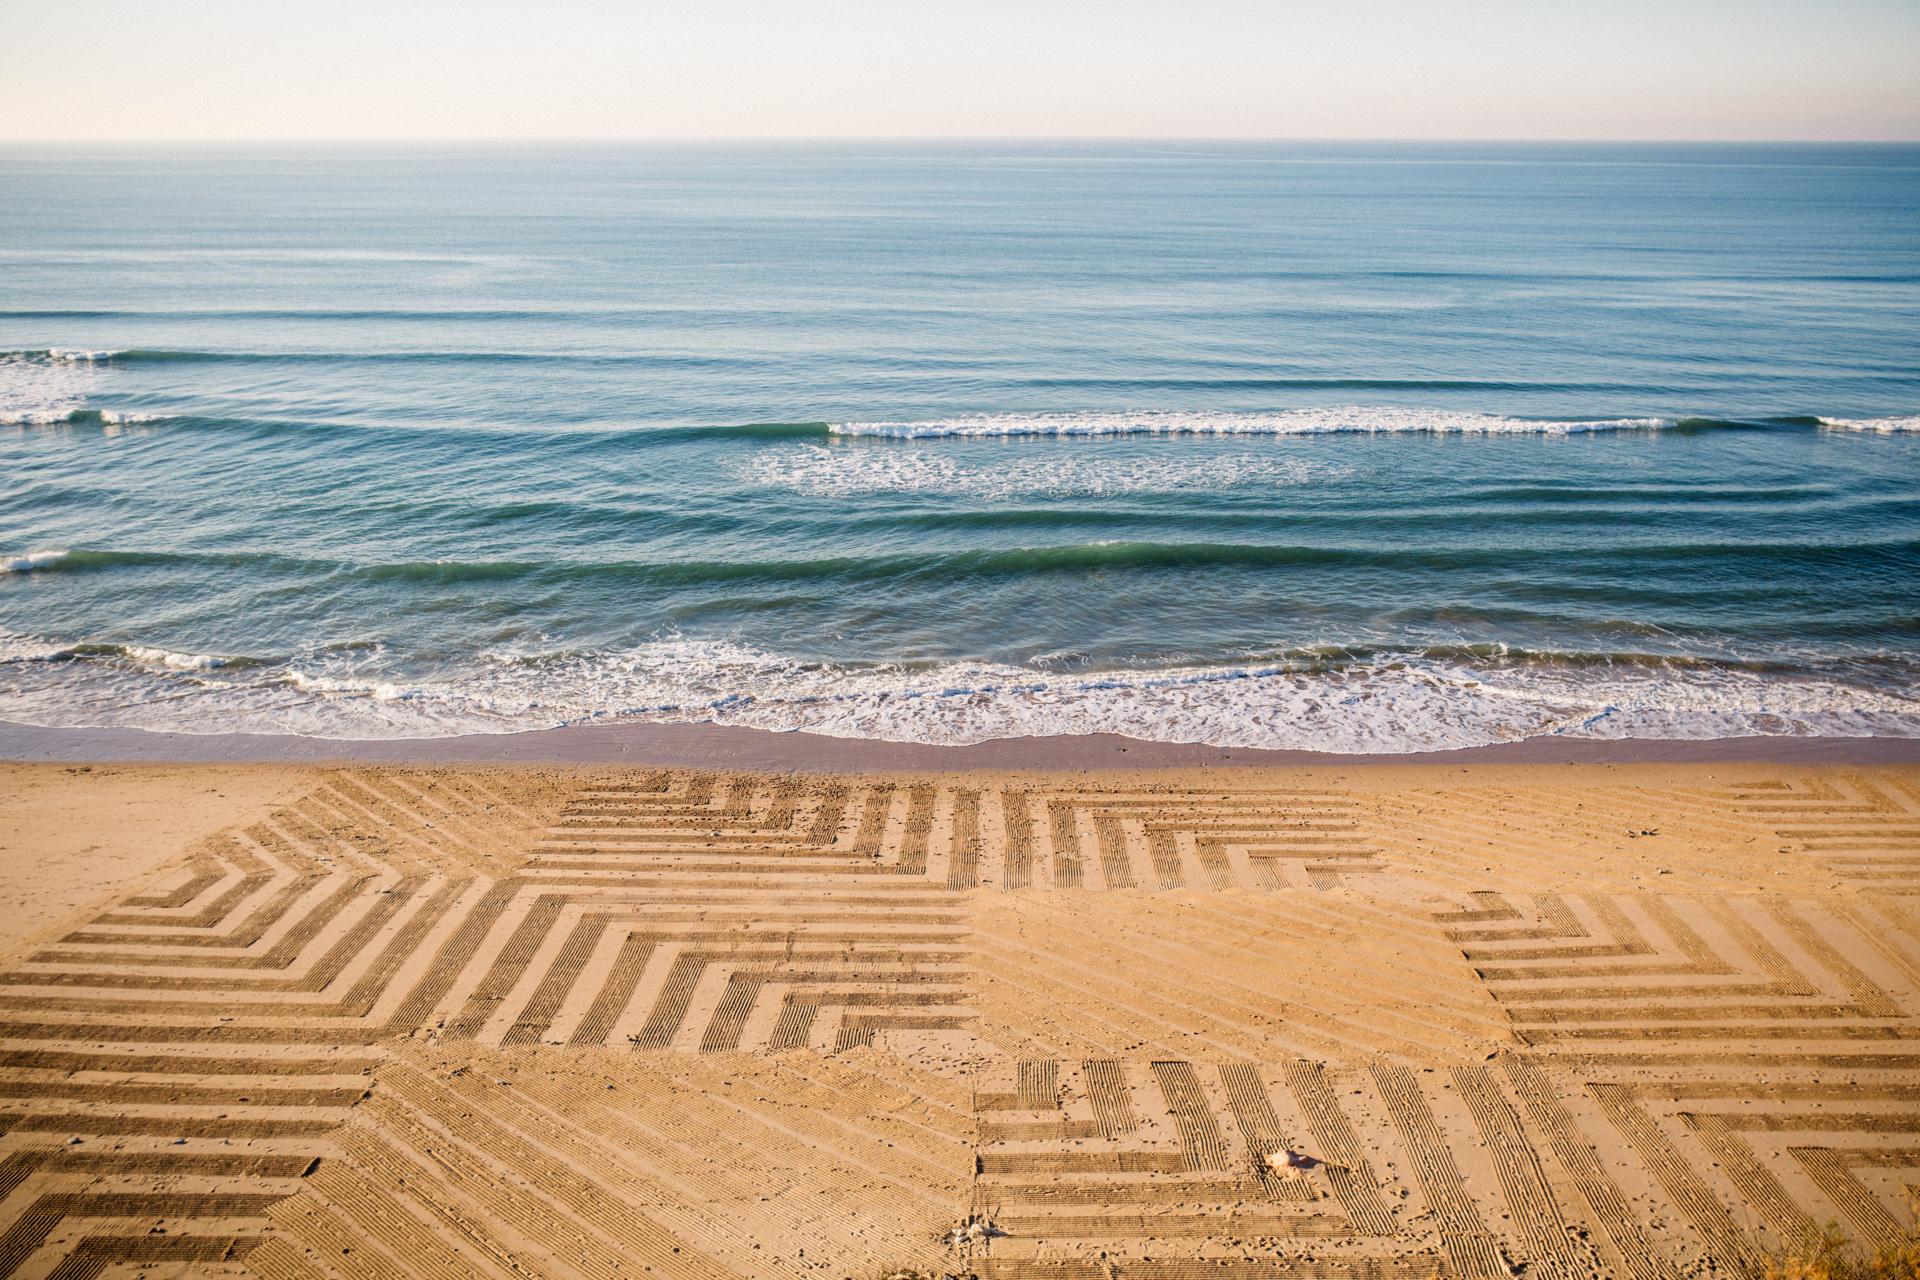 Damien-dohmen-sand-print-lx-one-24